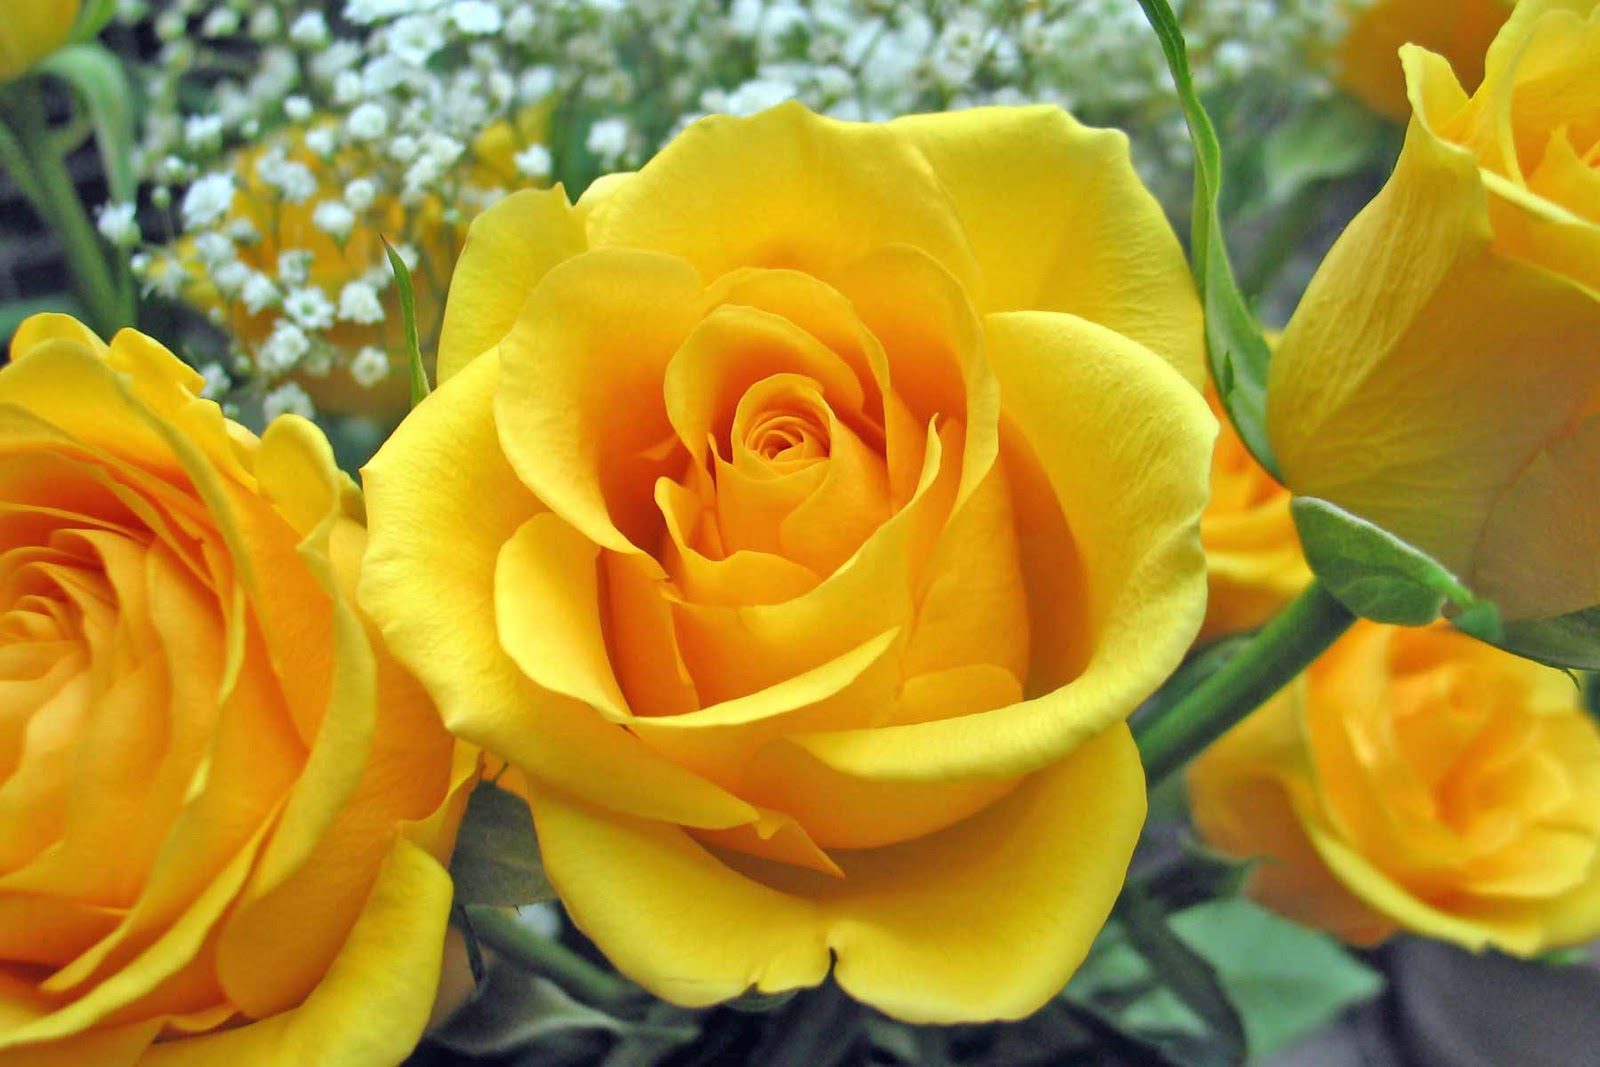 http://1.bp.blogspot.com/-EiIVhIblH20/TV311sY_JyI/AAAAAAAAJAo/OOE_BRgrndE/s1600/yellow+rose+flowers+wallpapers+%25283%2529.jpg